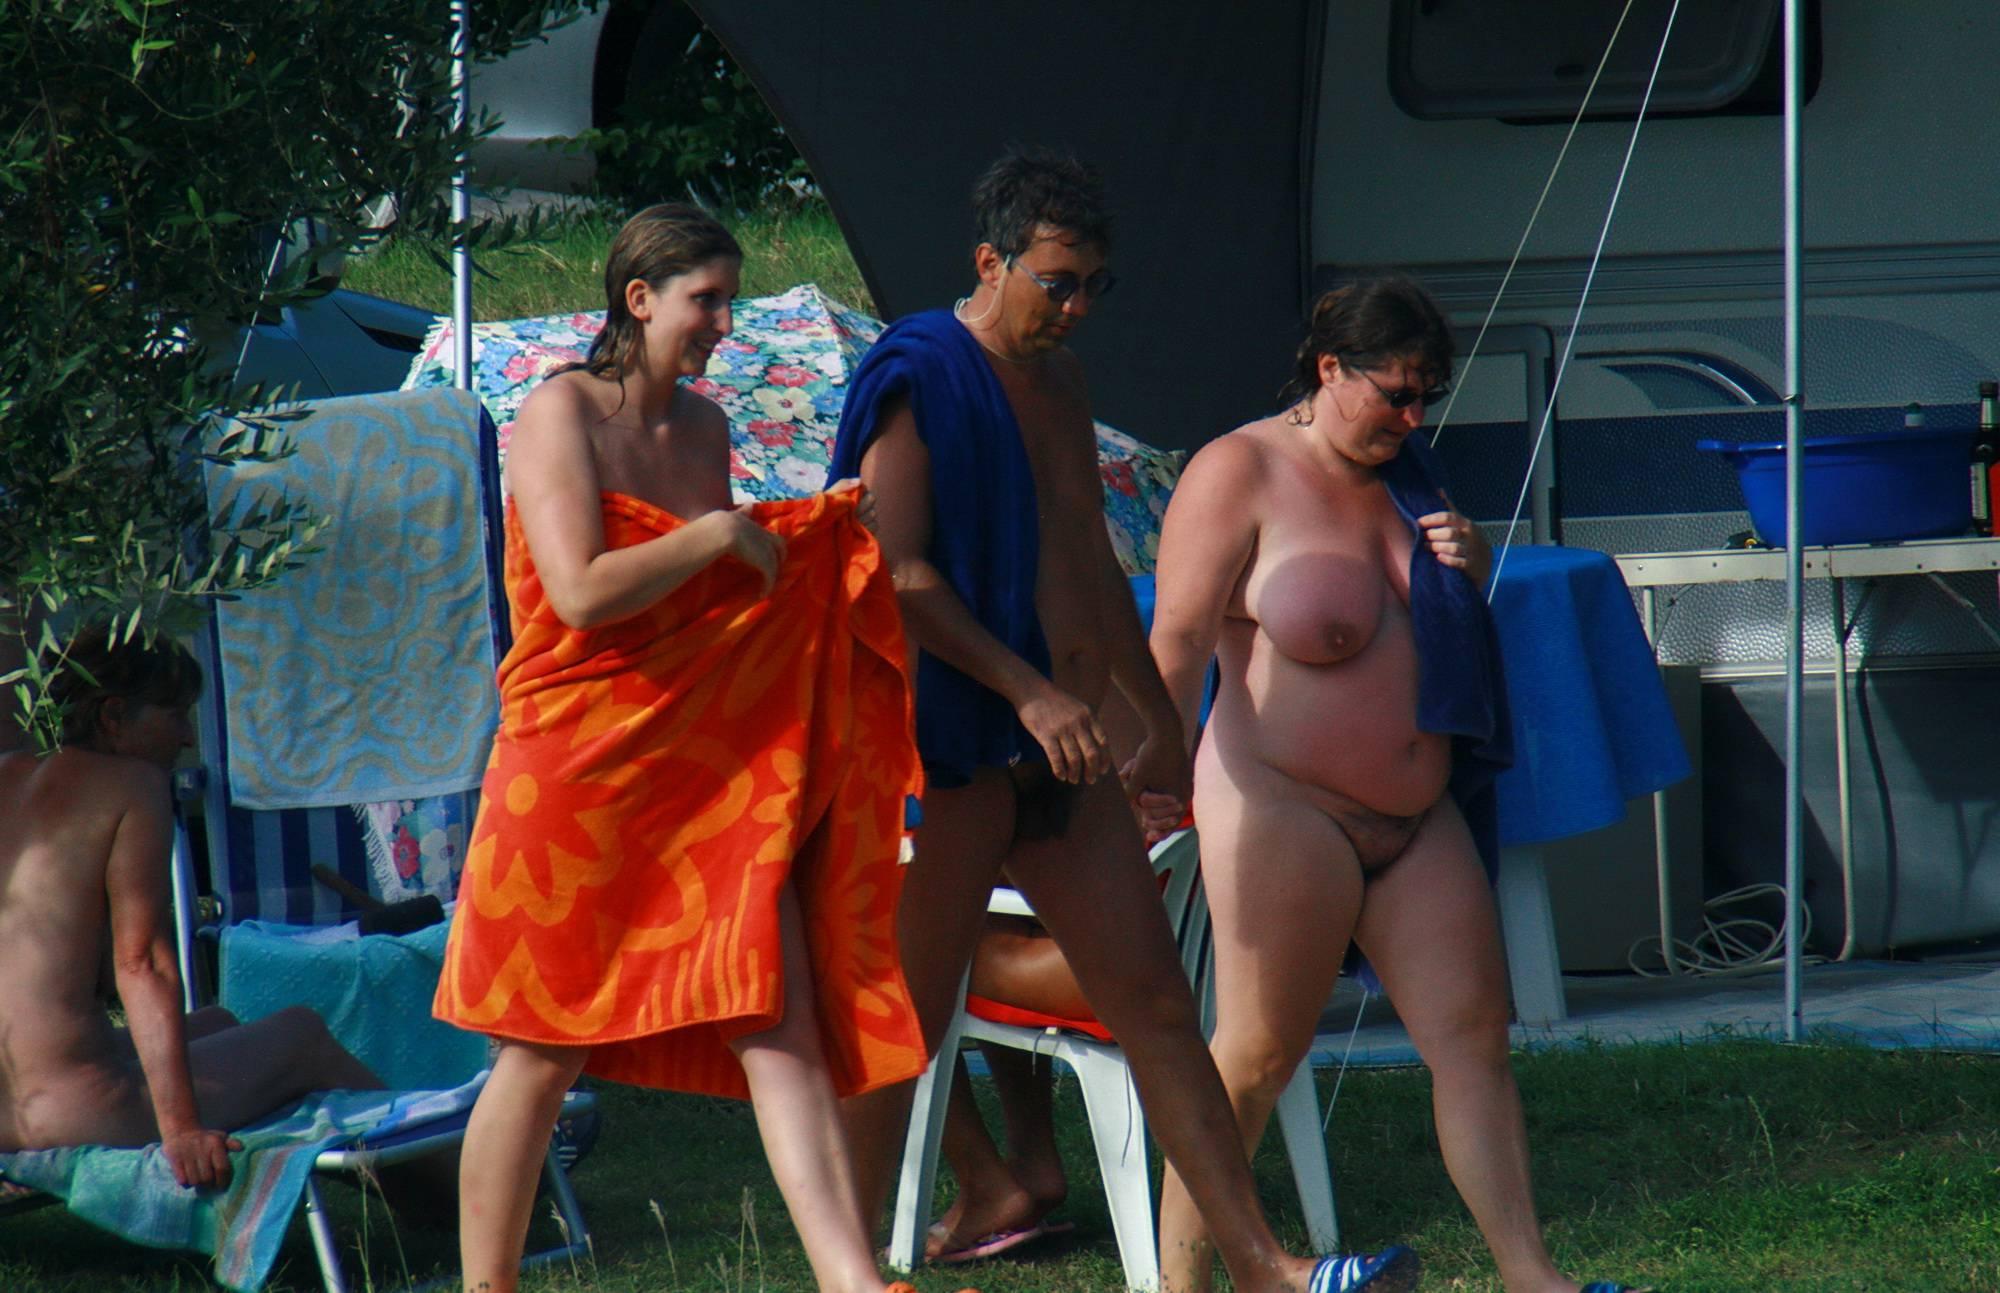 Colorful Towel Sun Drying - 2